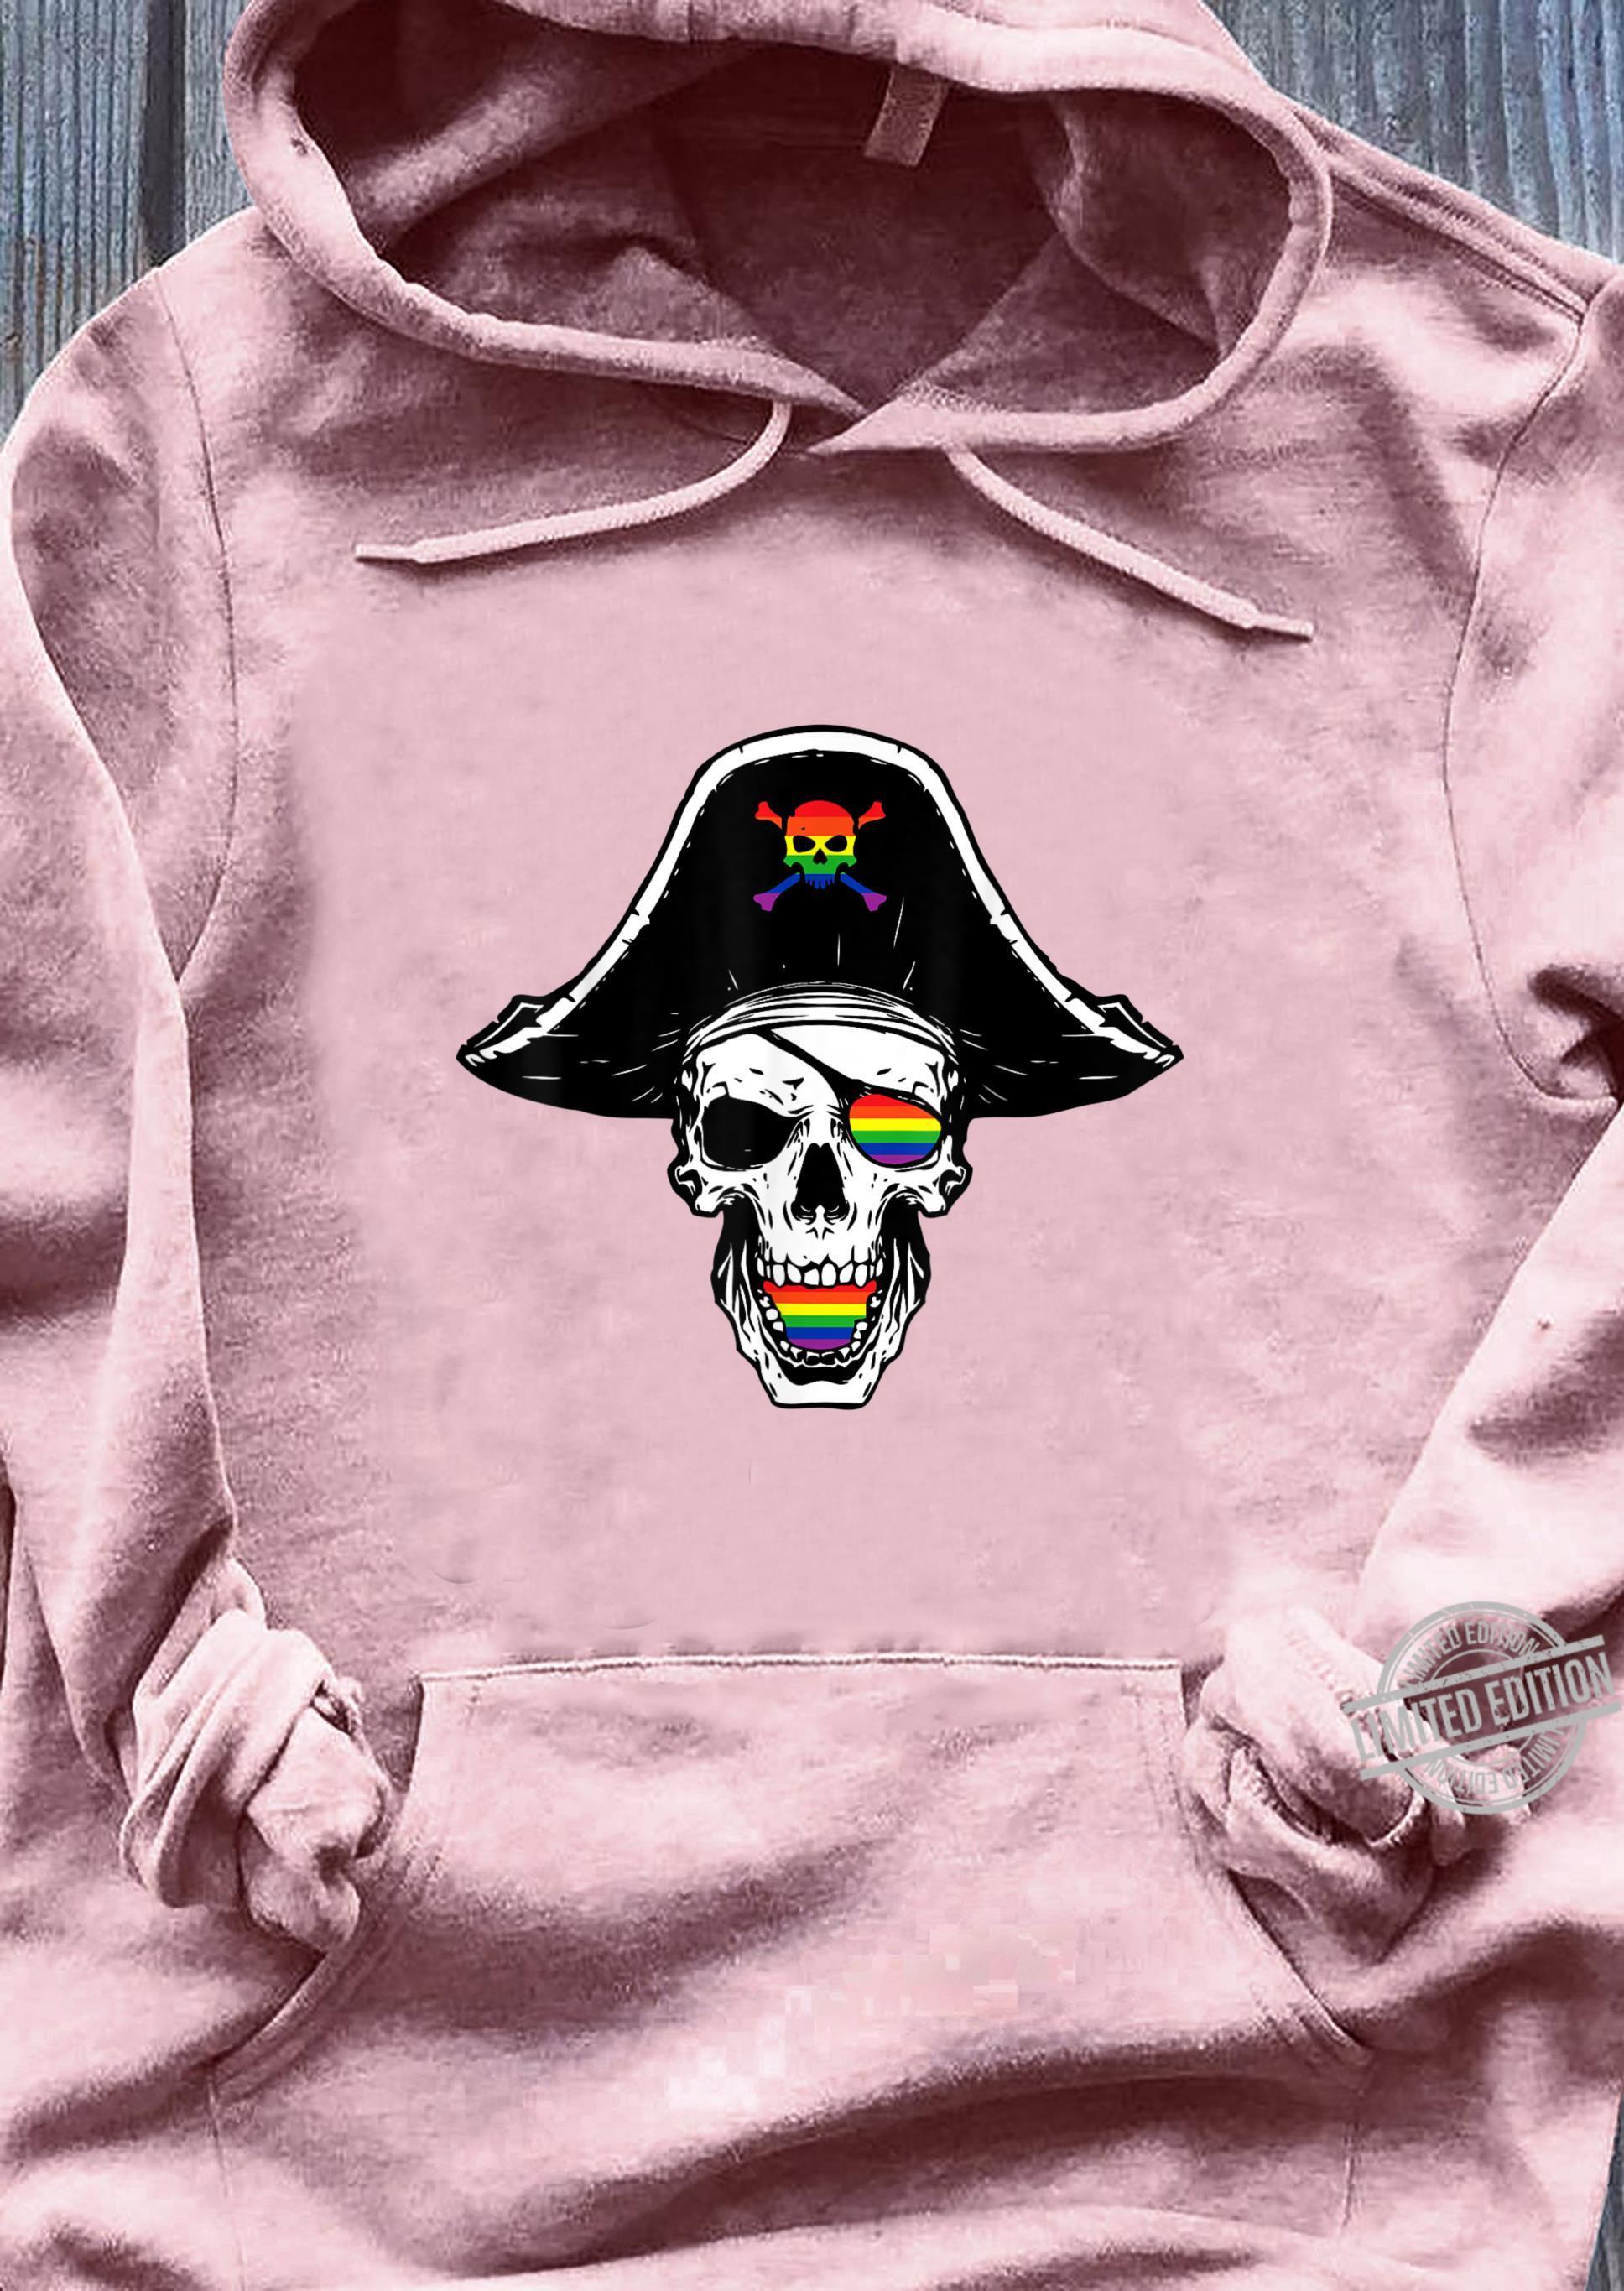 Gay Pirate Skull Crosbones Pride Flag LGBTQ Cool LGBT Shirt sweater